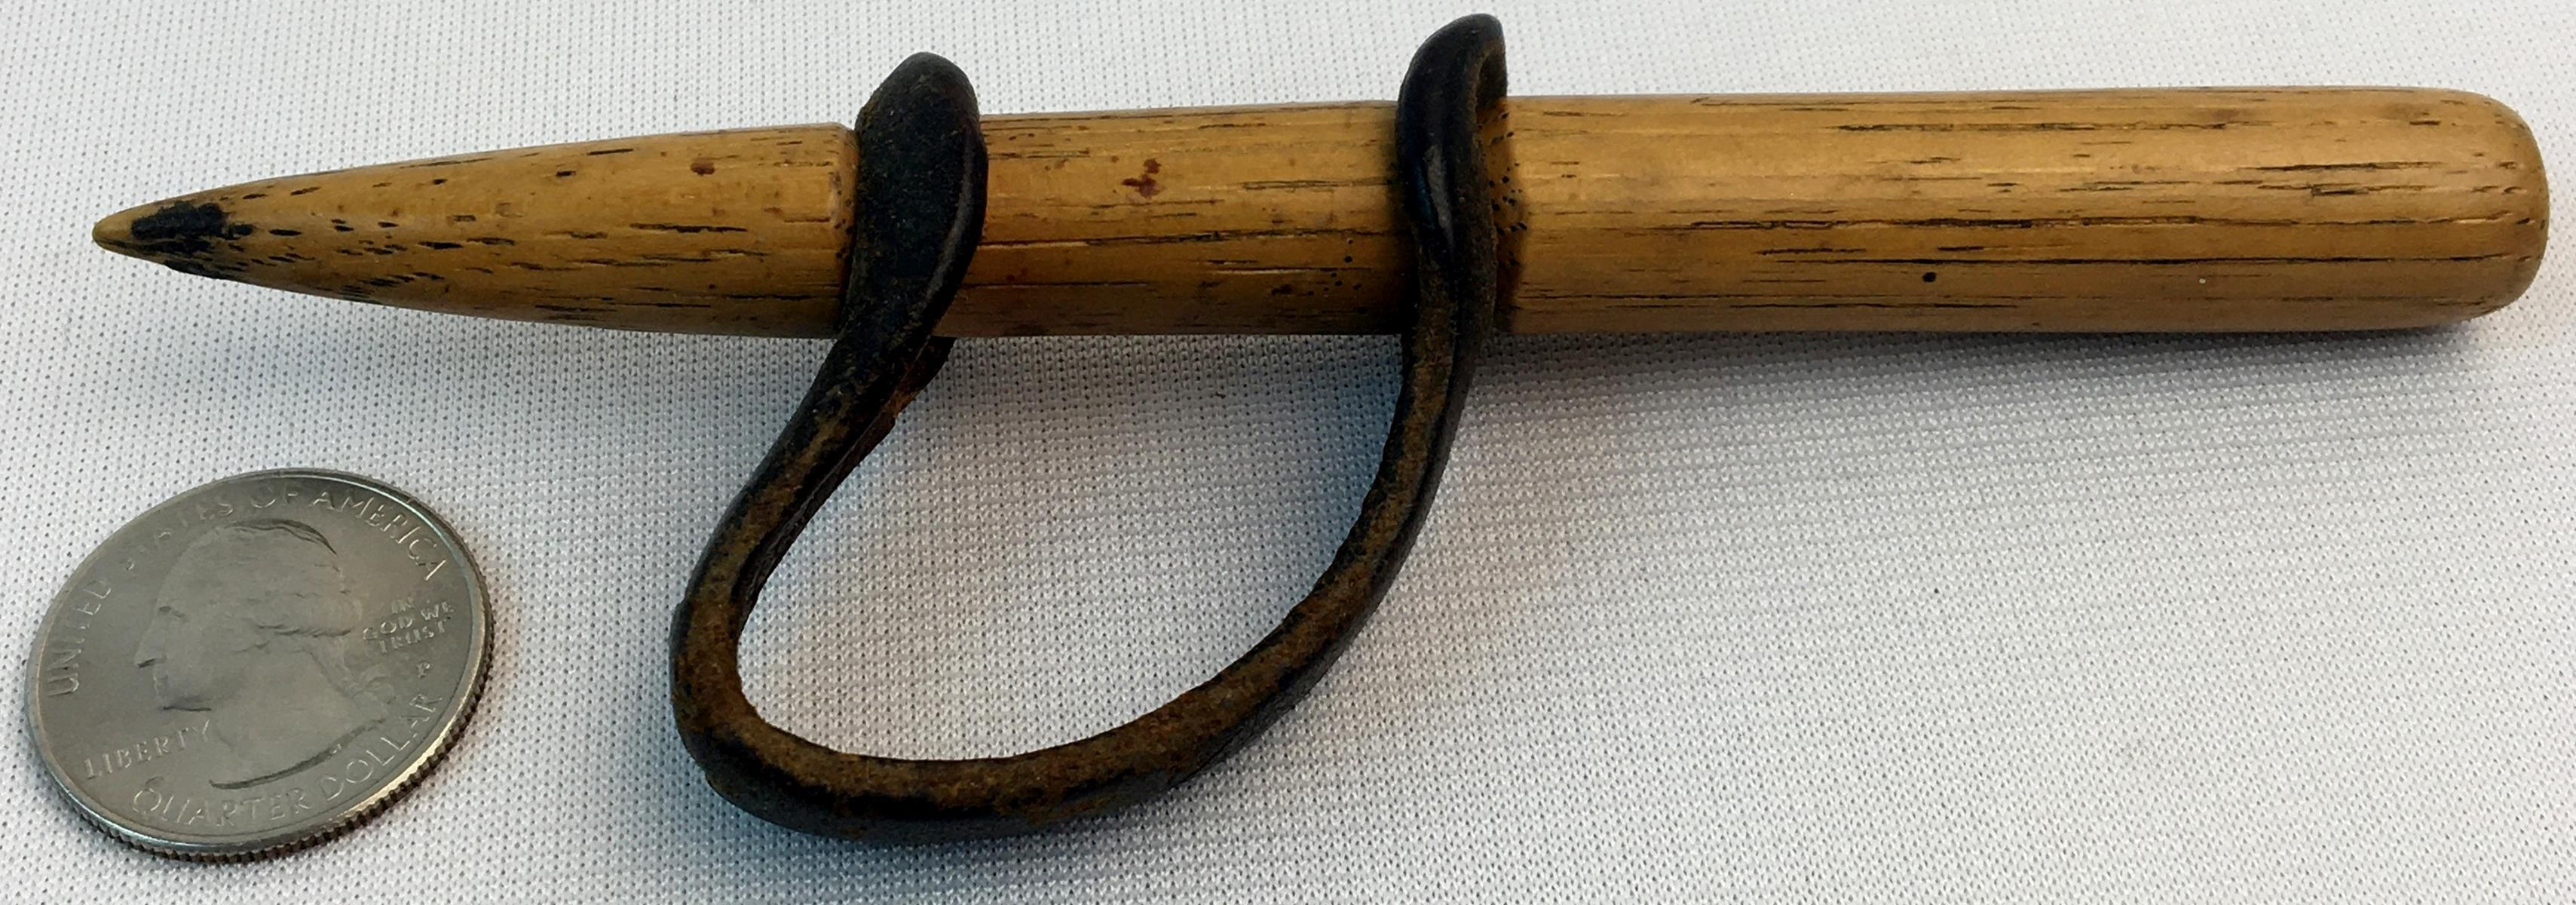 Antique Primitive Wood & Leather Corn Husking Peg